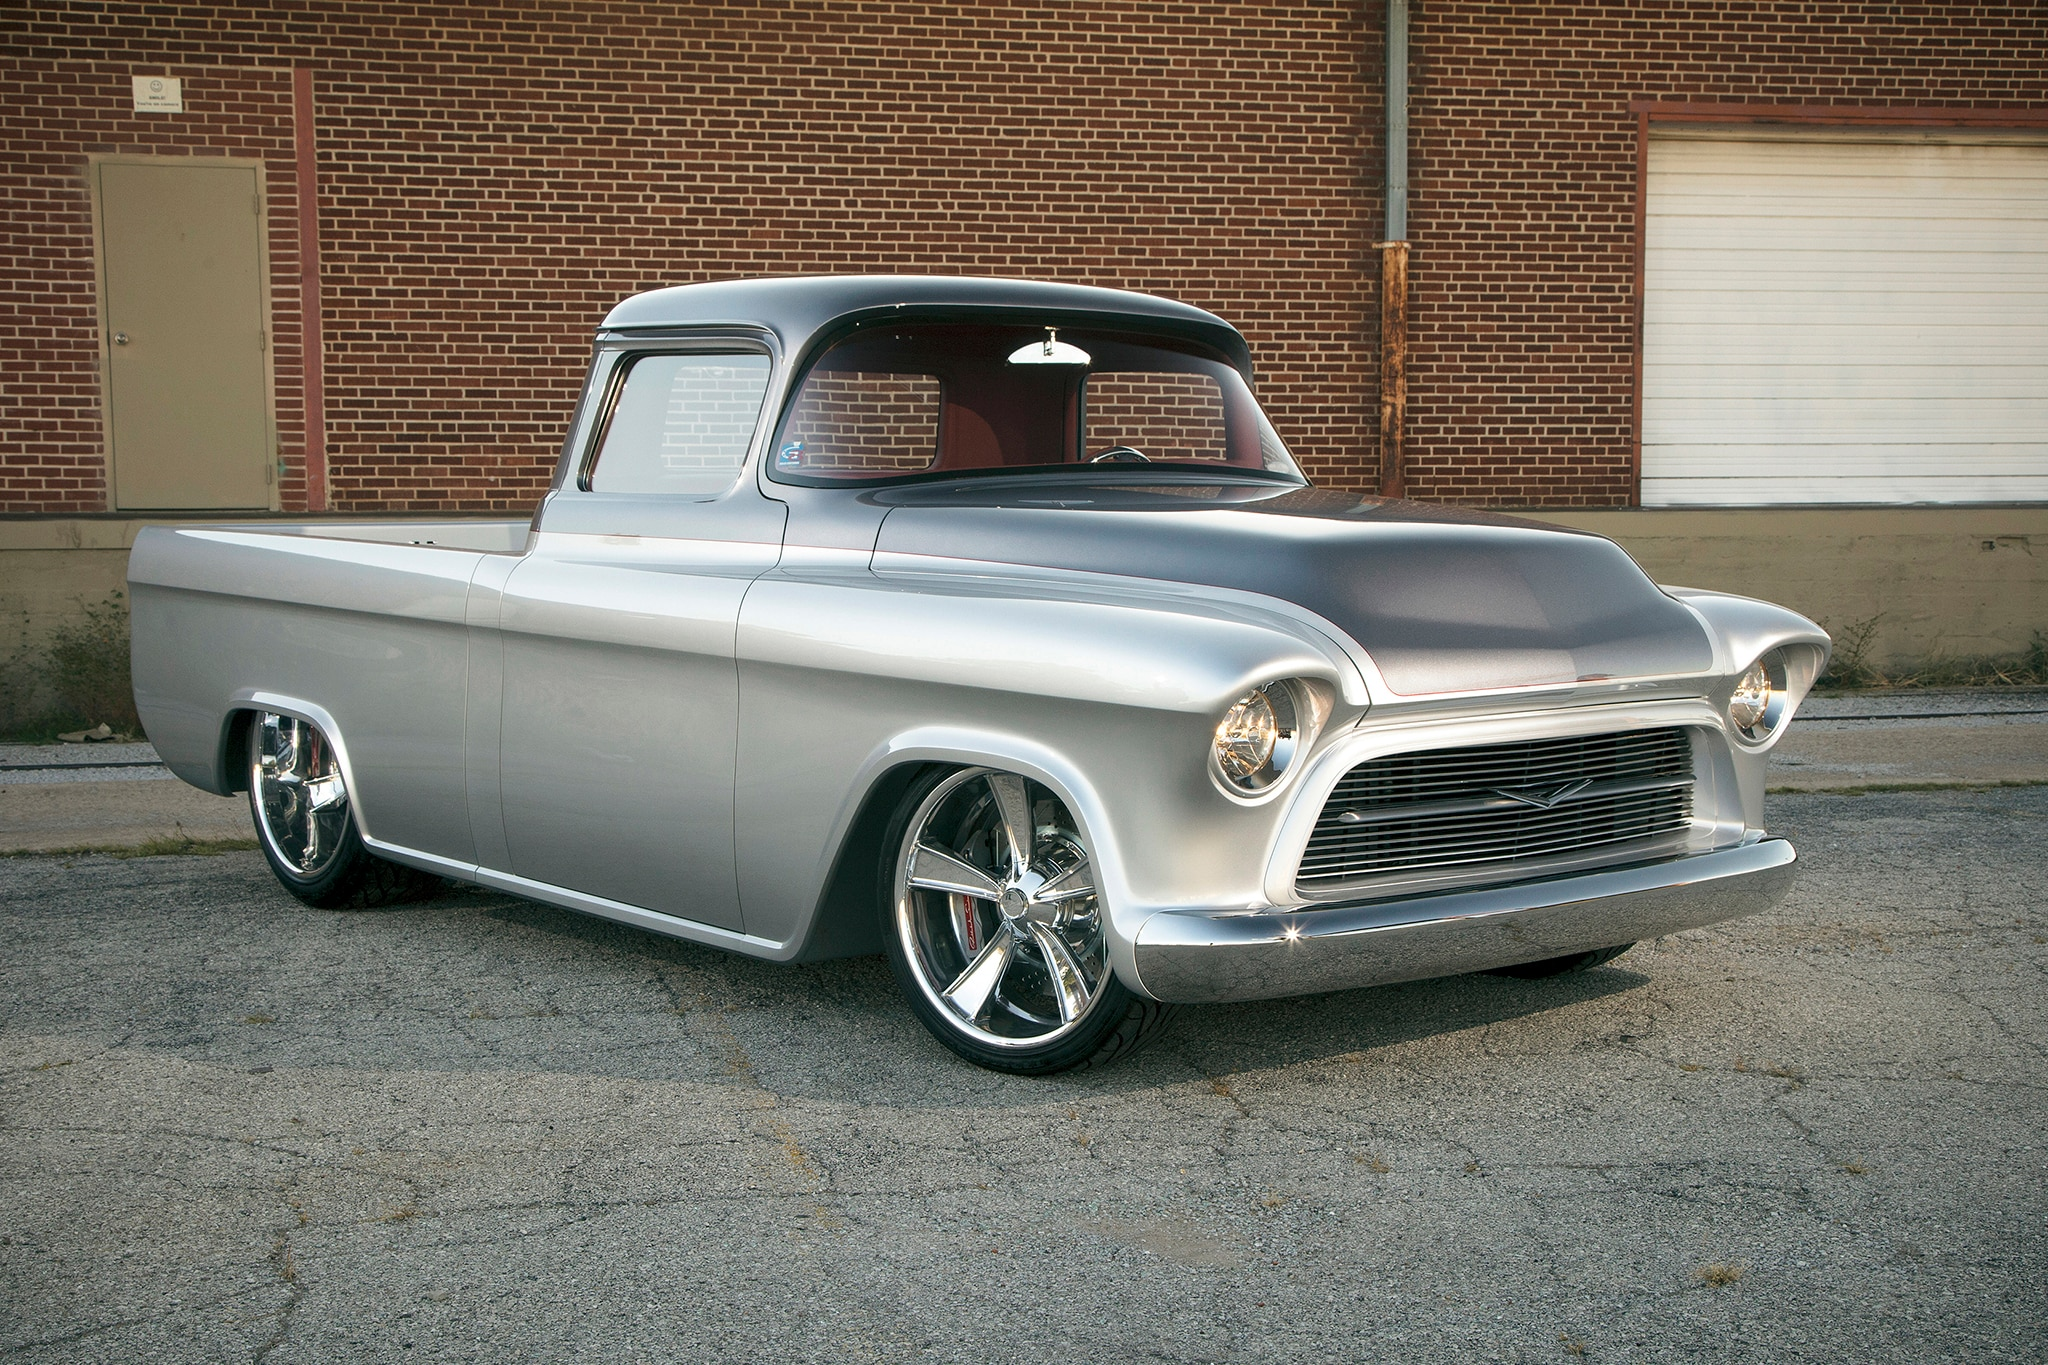 Nine Classic Custom Chevrolet Trucks That Claimed Over $100,000 at ...